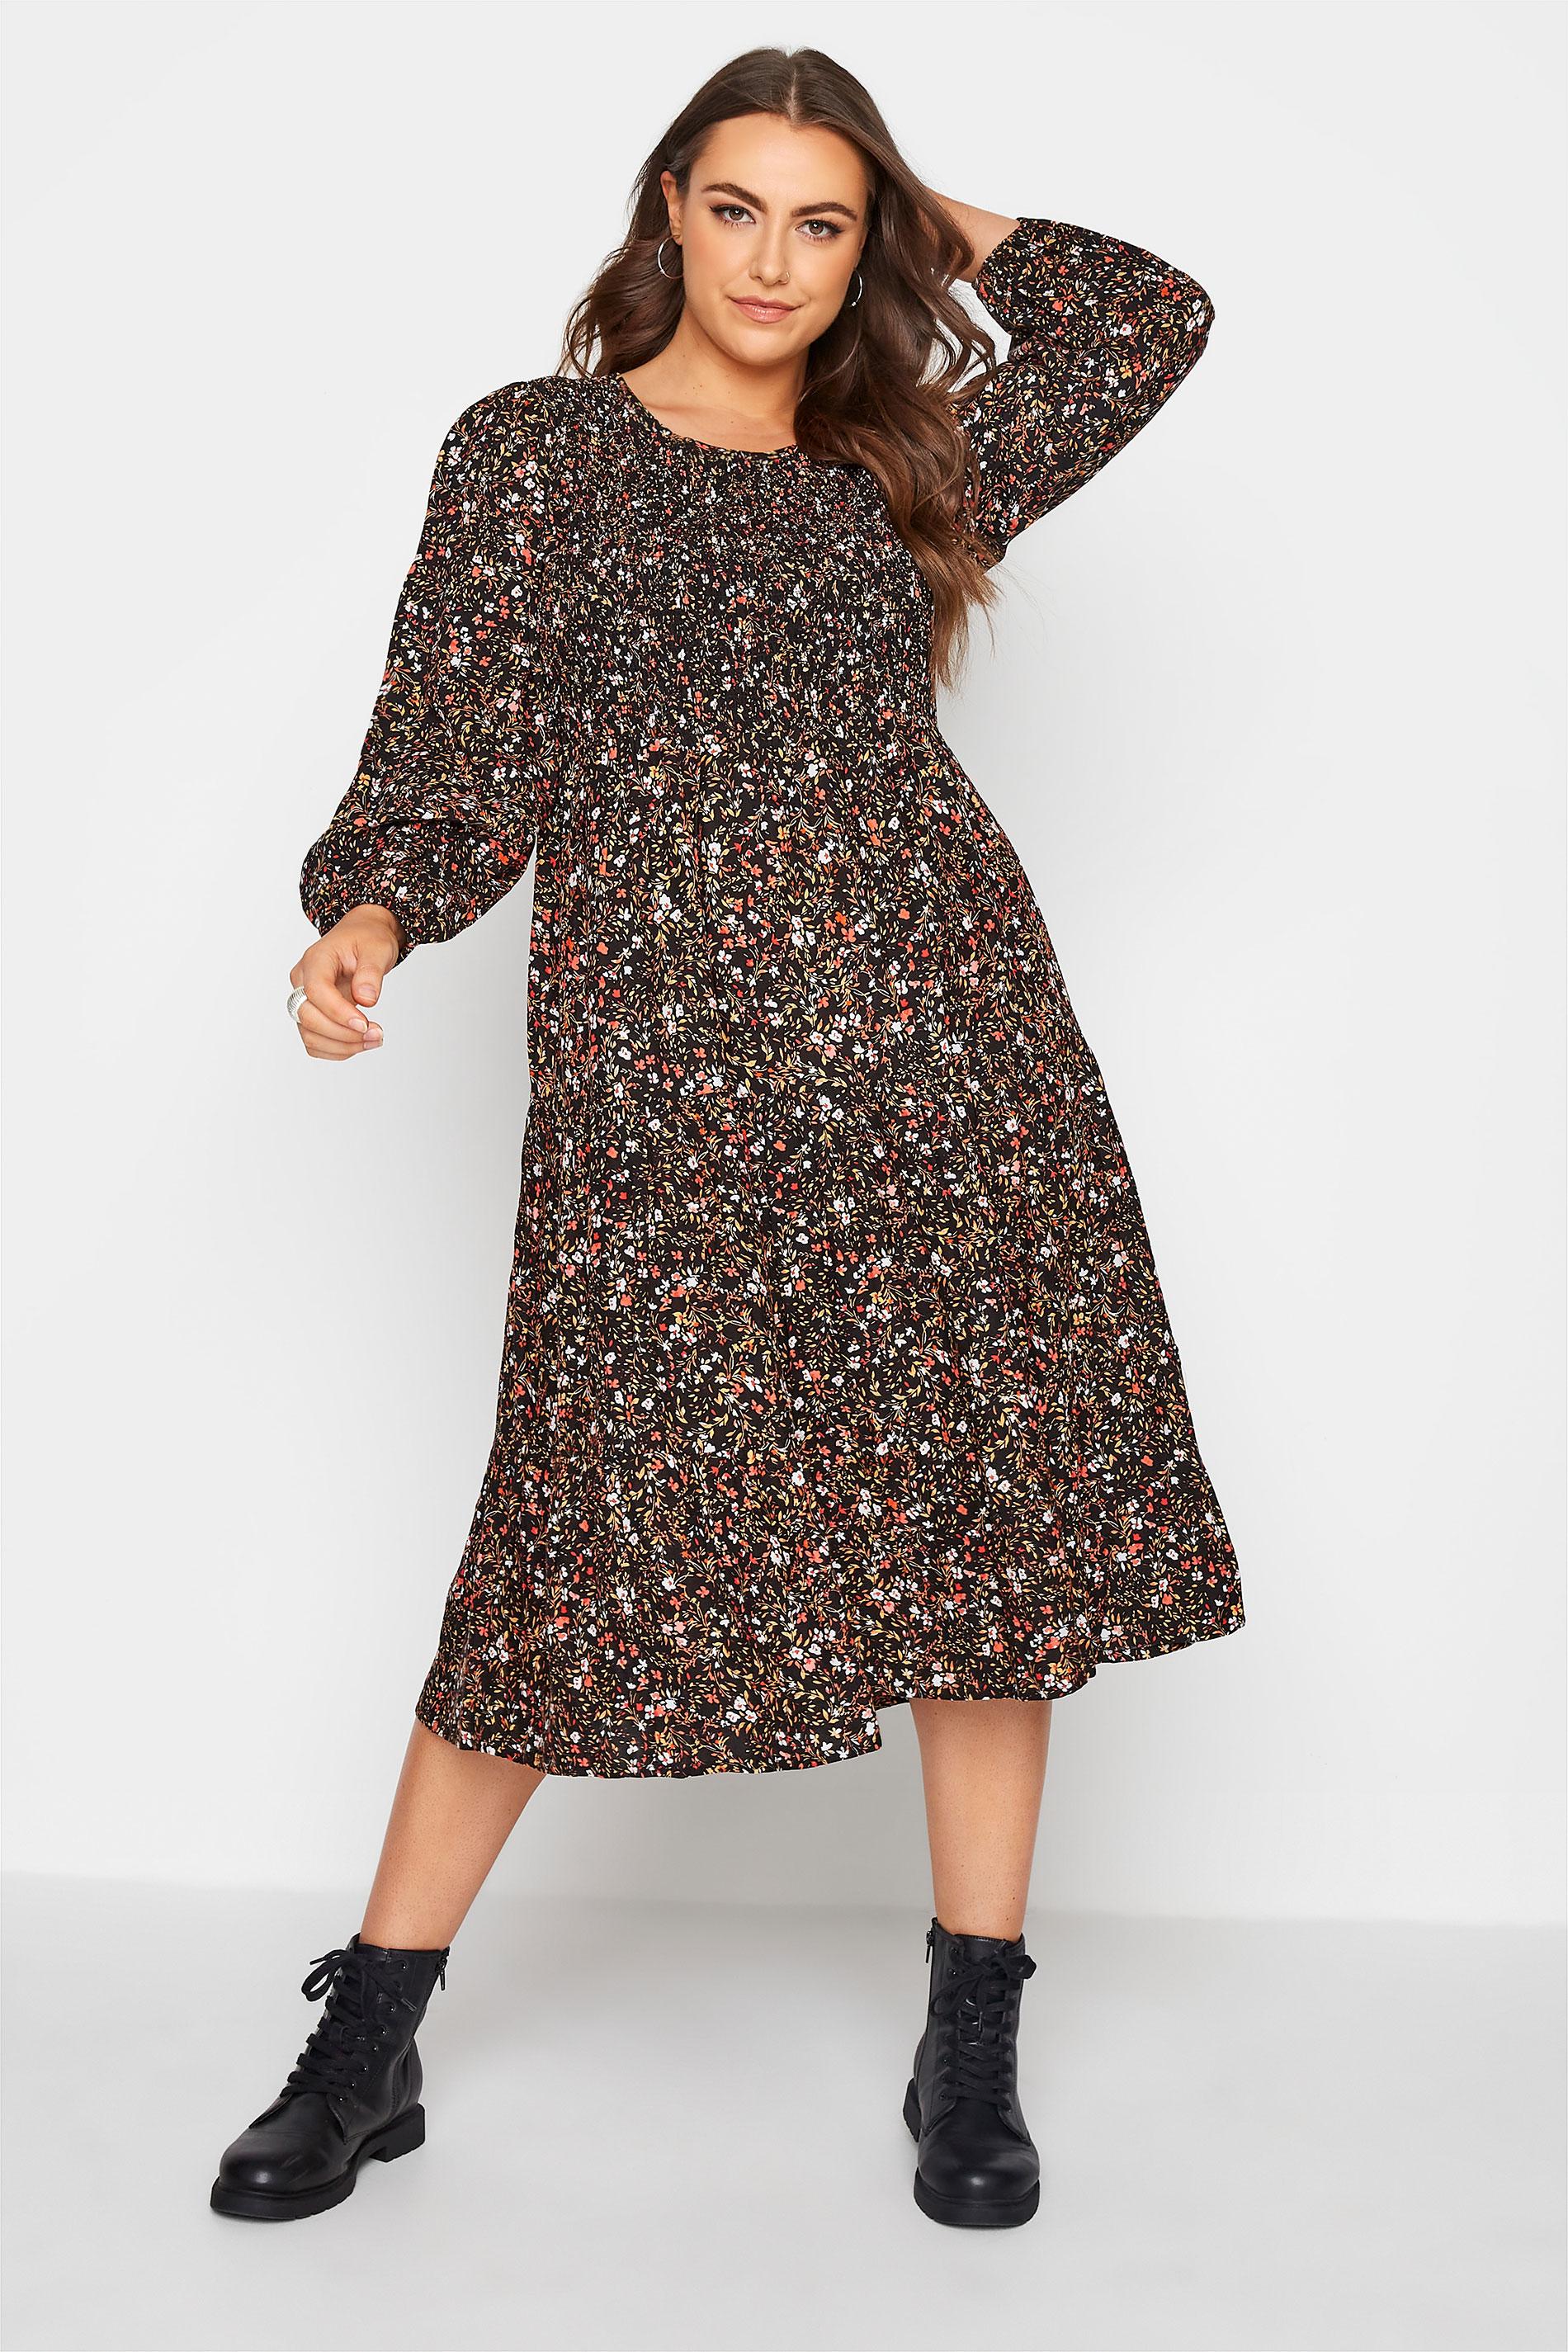 Black Floral Shirred Midaxi Dress_A.jpg